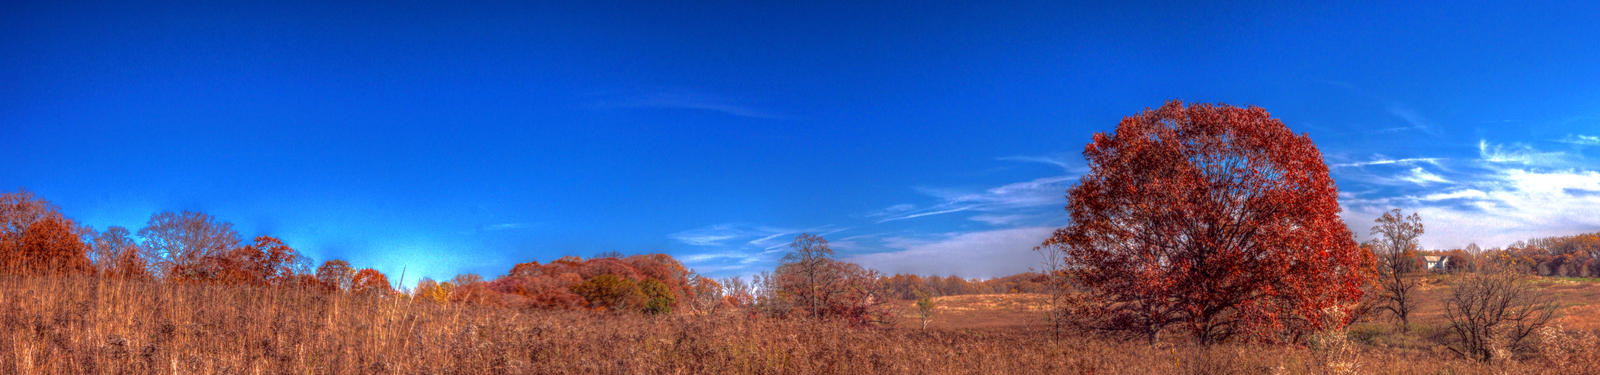 Panorama 3859 hdr pregamma 1 mantiuk06 contrast ma